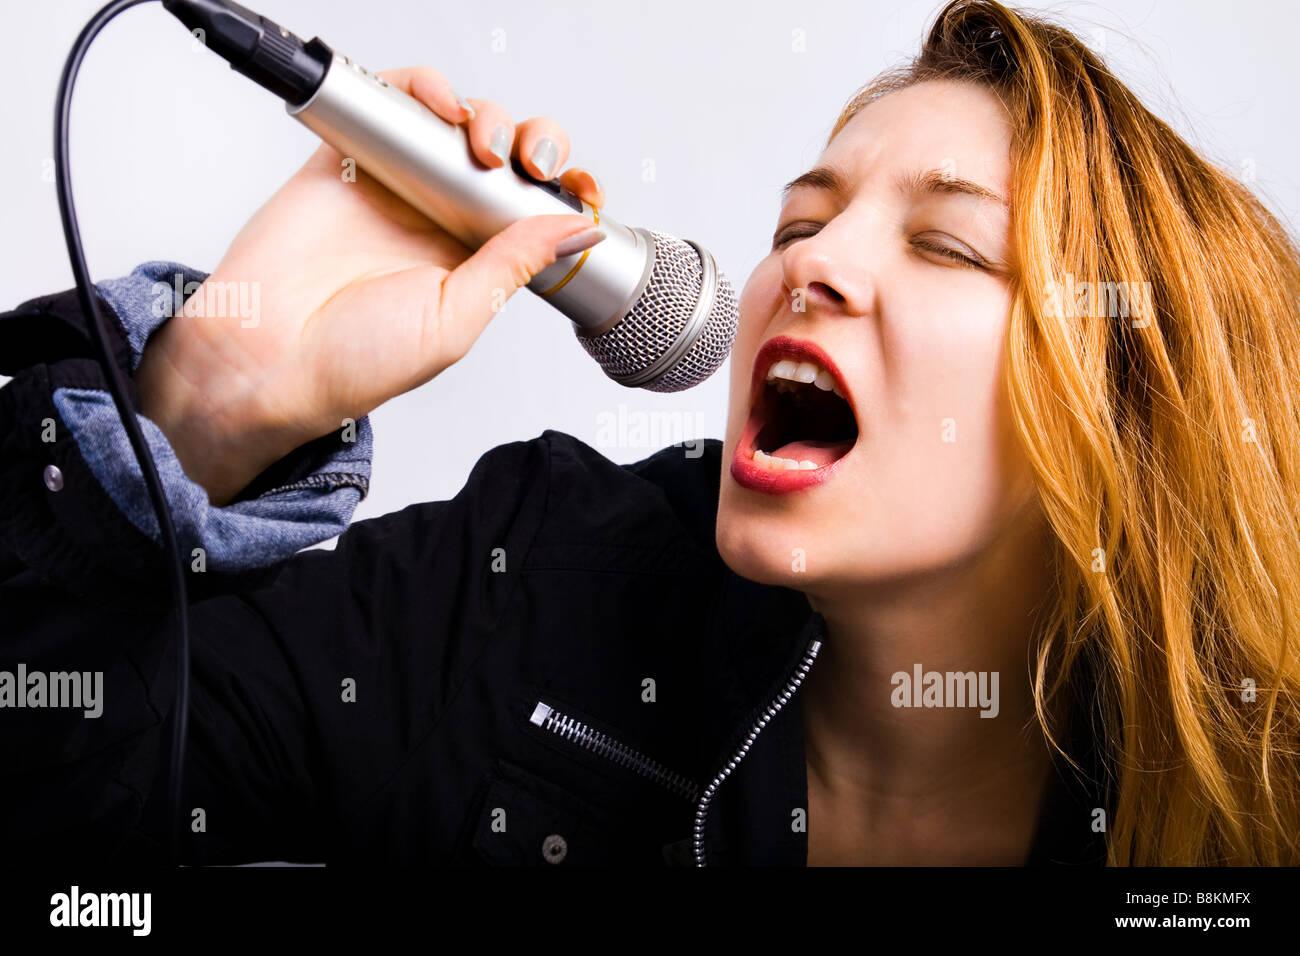 Young female karaoke singer singing music at microphone - Stock Image